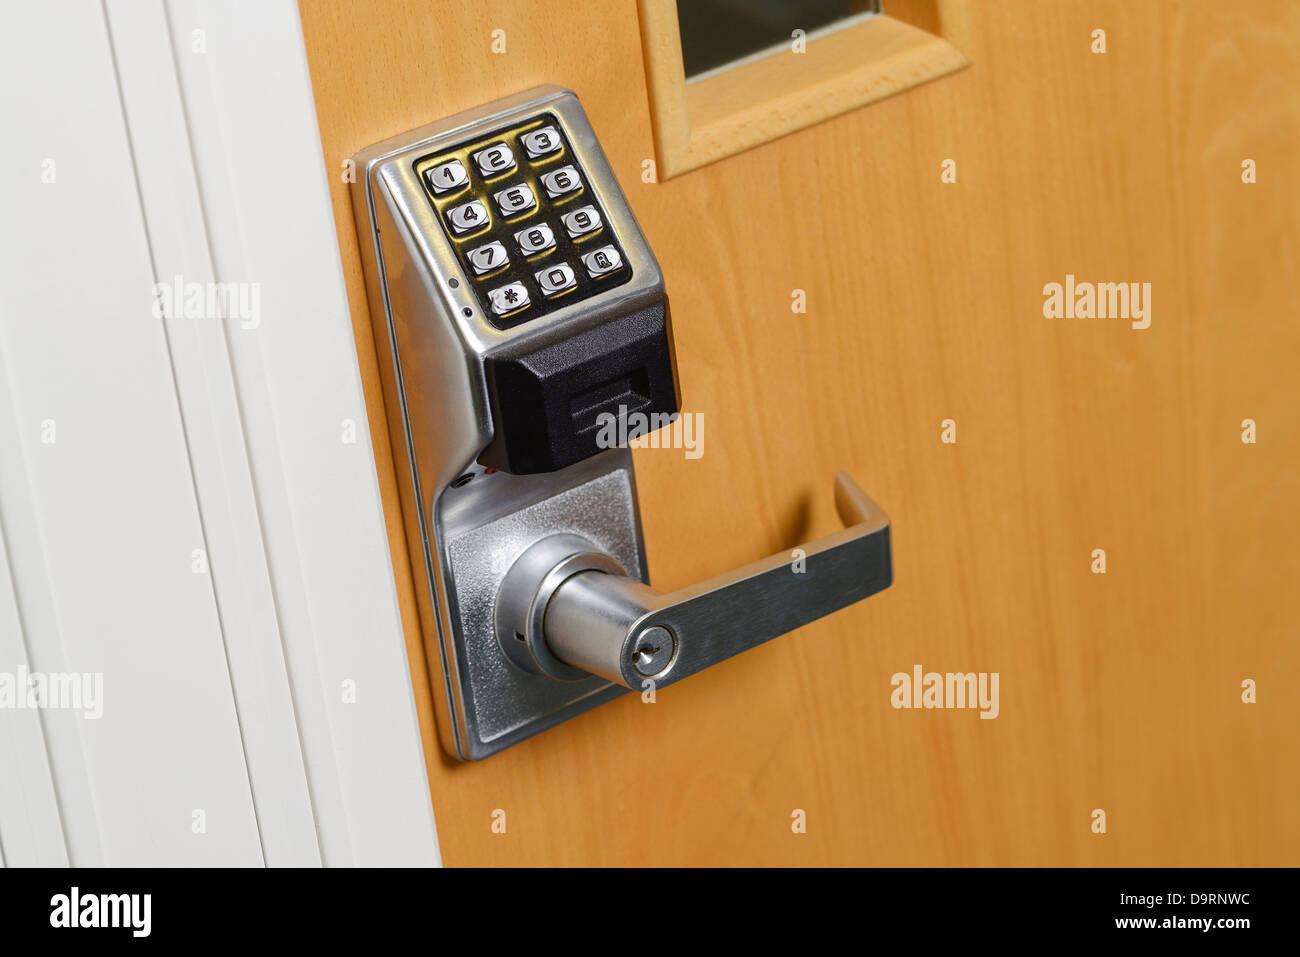 Digital keypad office door handle - Stock Image